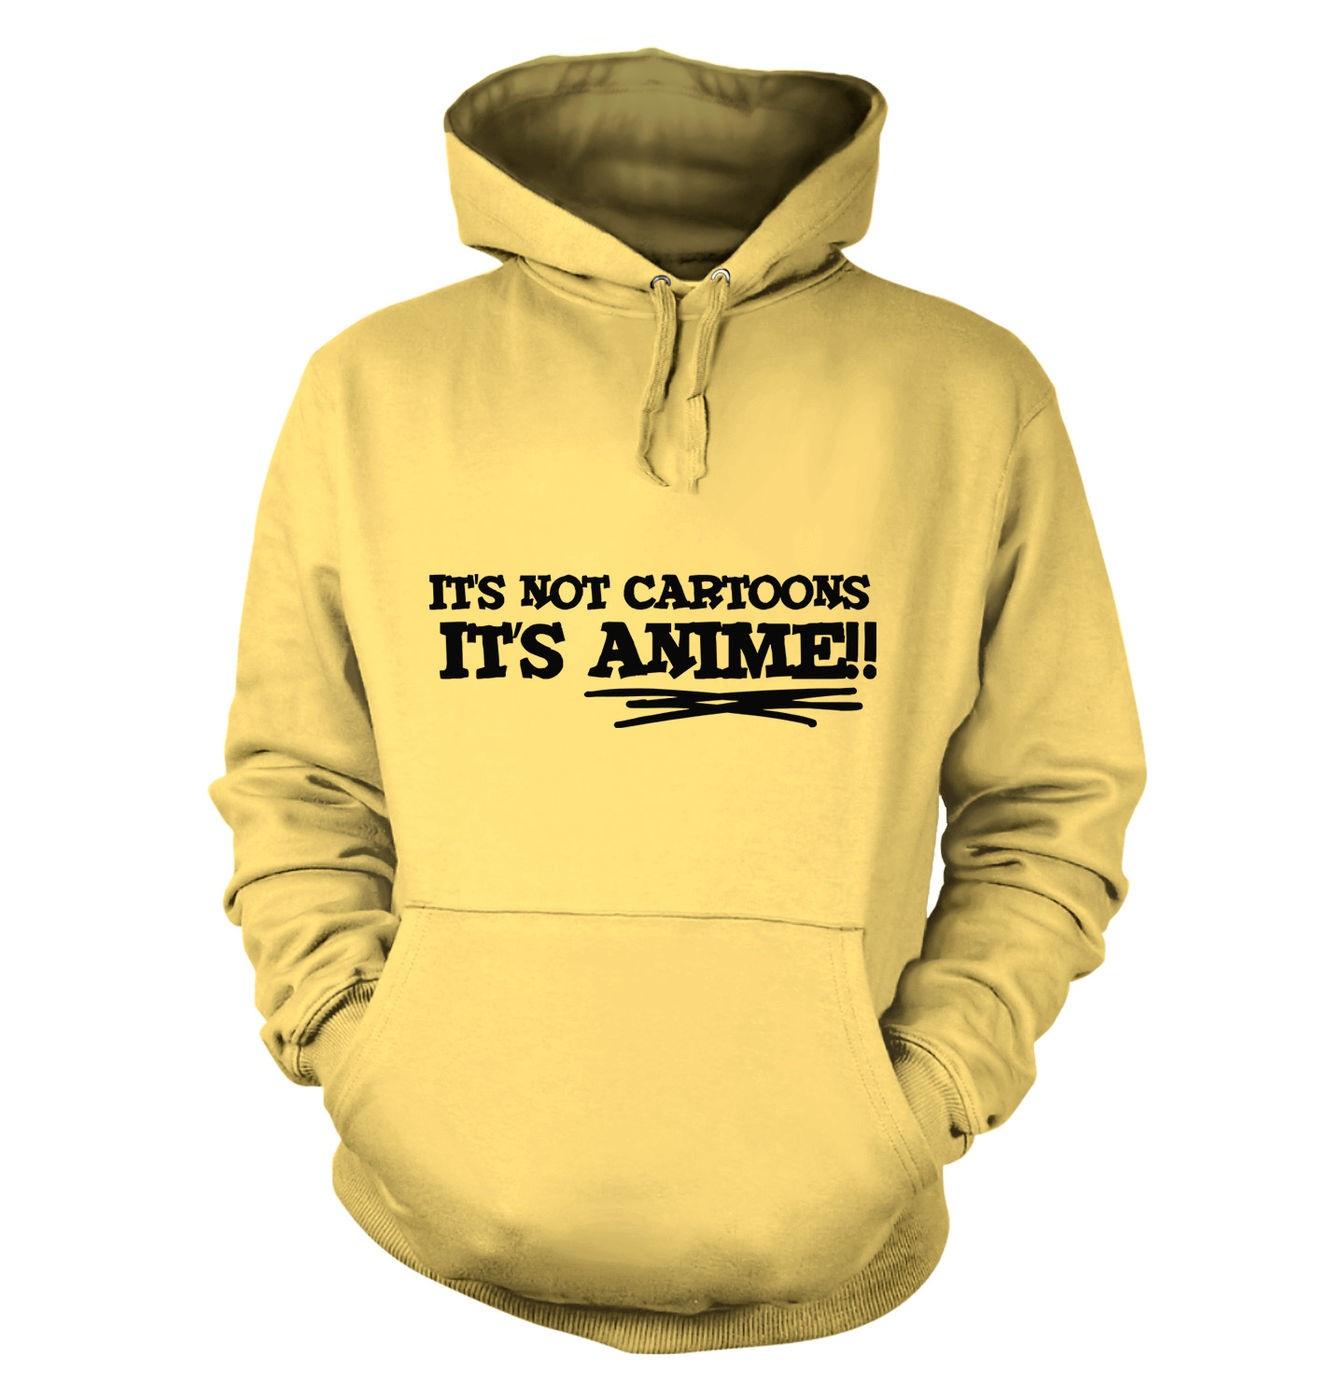 It's Not Cartoons! adults' hoodie